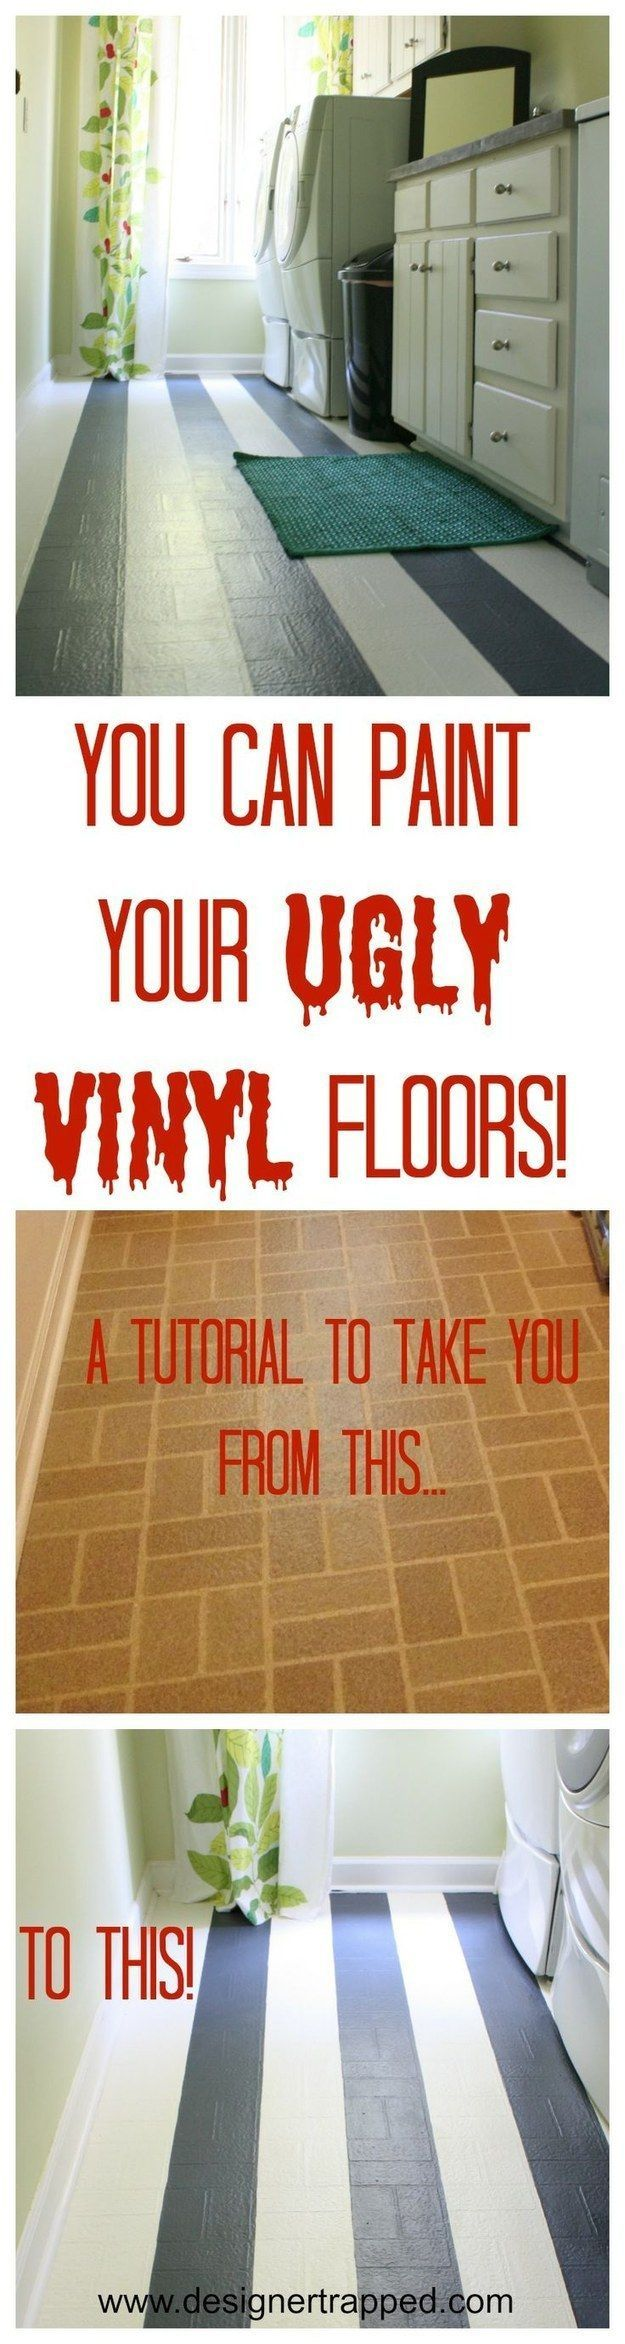 Home improvement projects simple paintings budgeting and tutorials home improvement projects linoleum flooringvinyl flooringpainting dailygadgetfo Choice Image